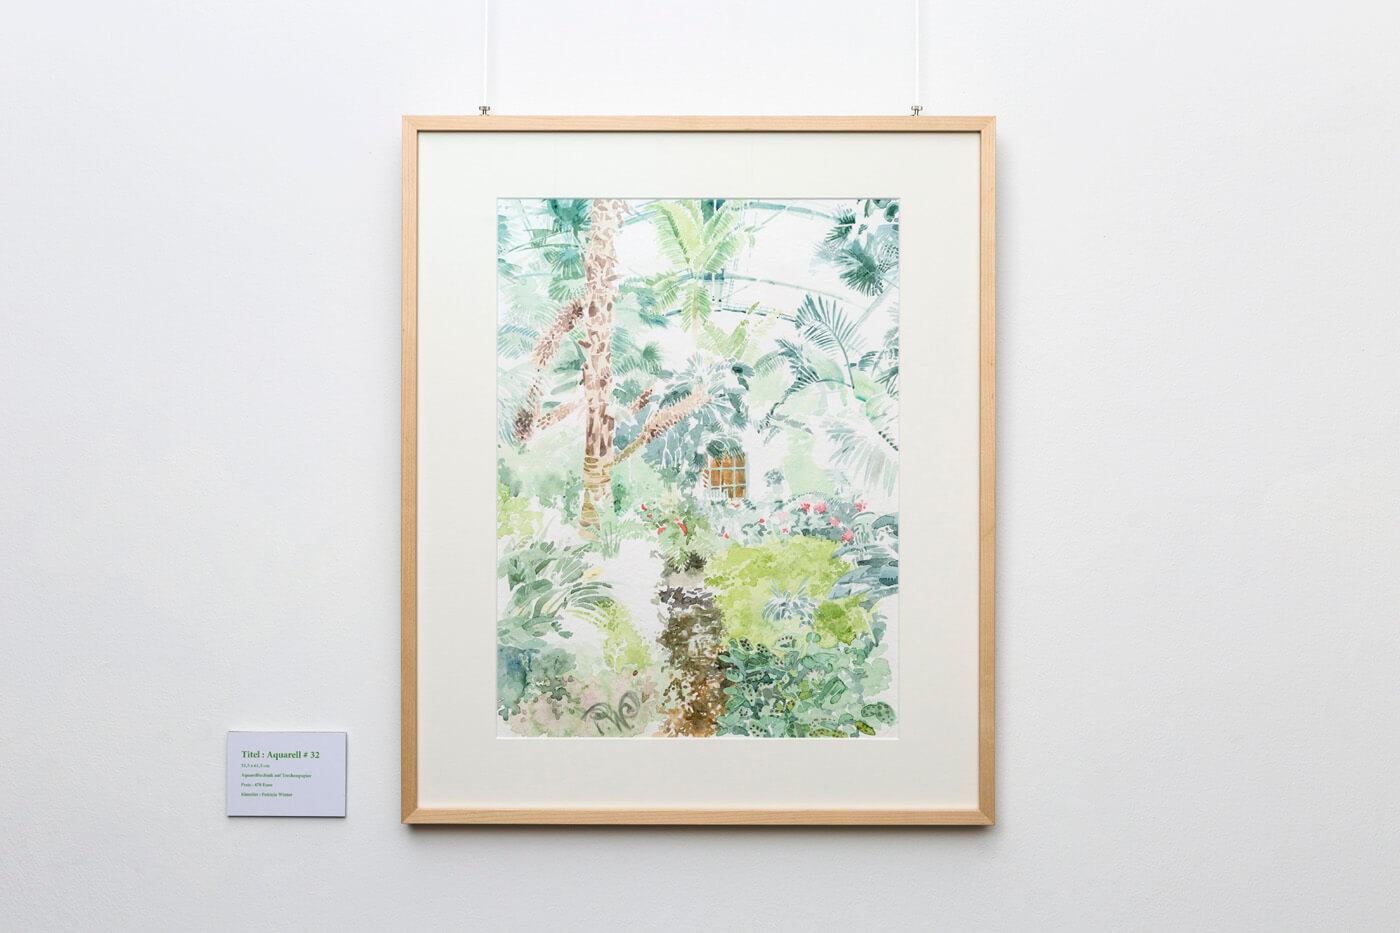 IMMER GRÜN – Palmenhaus - Aquarelle von Patricia Winter